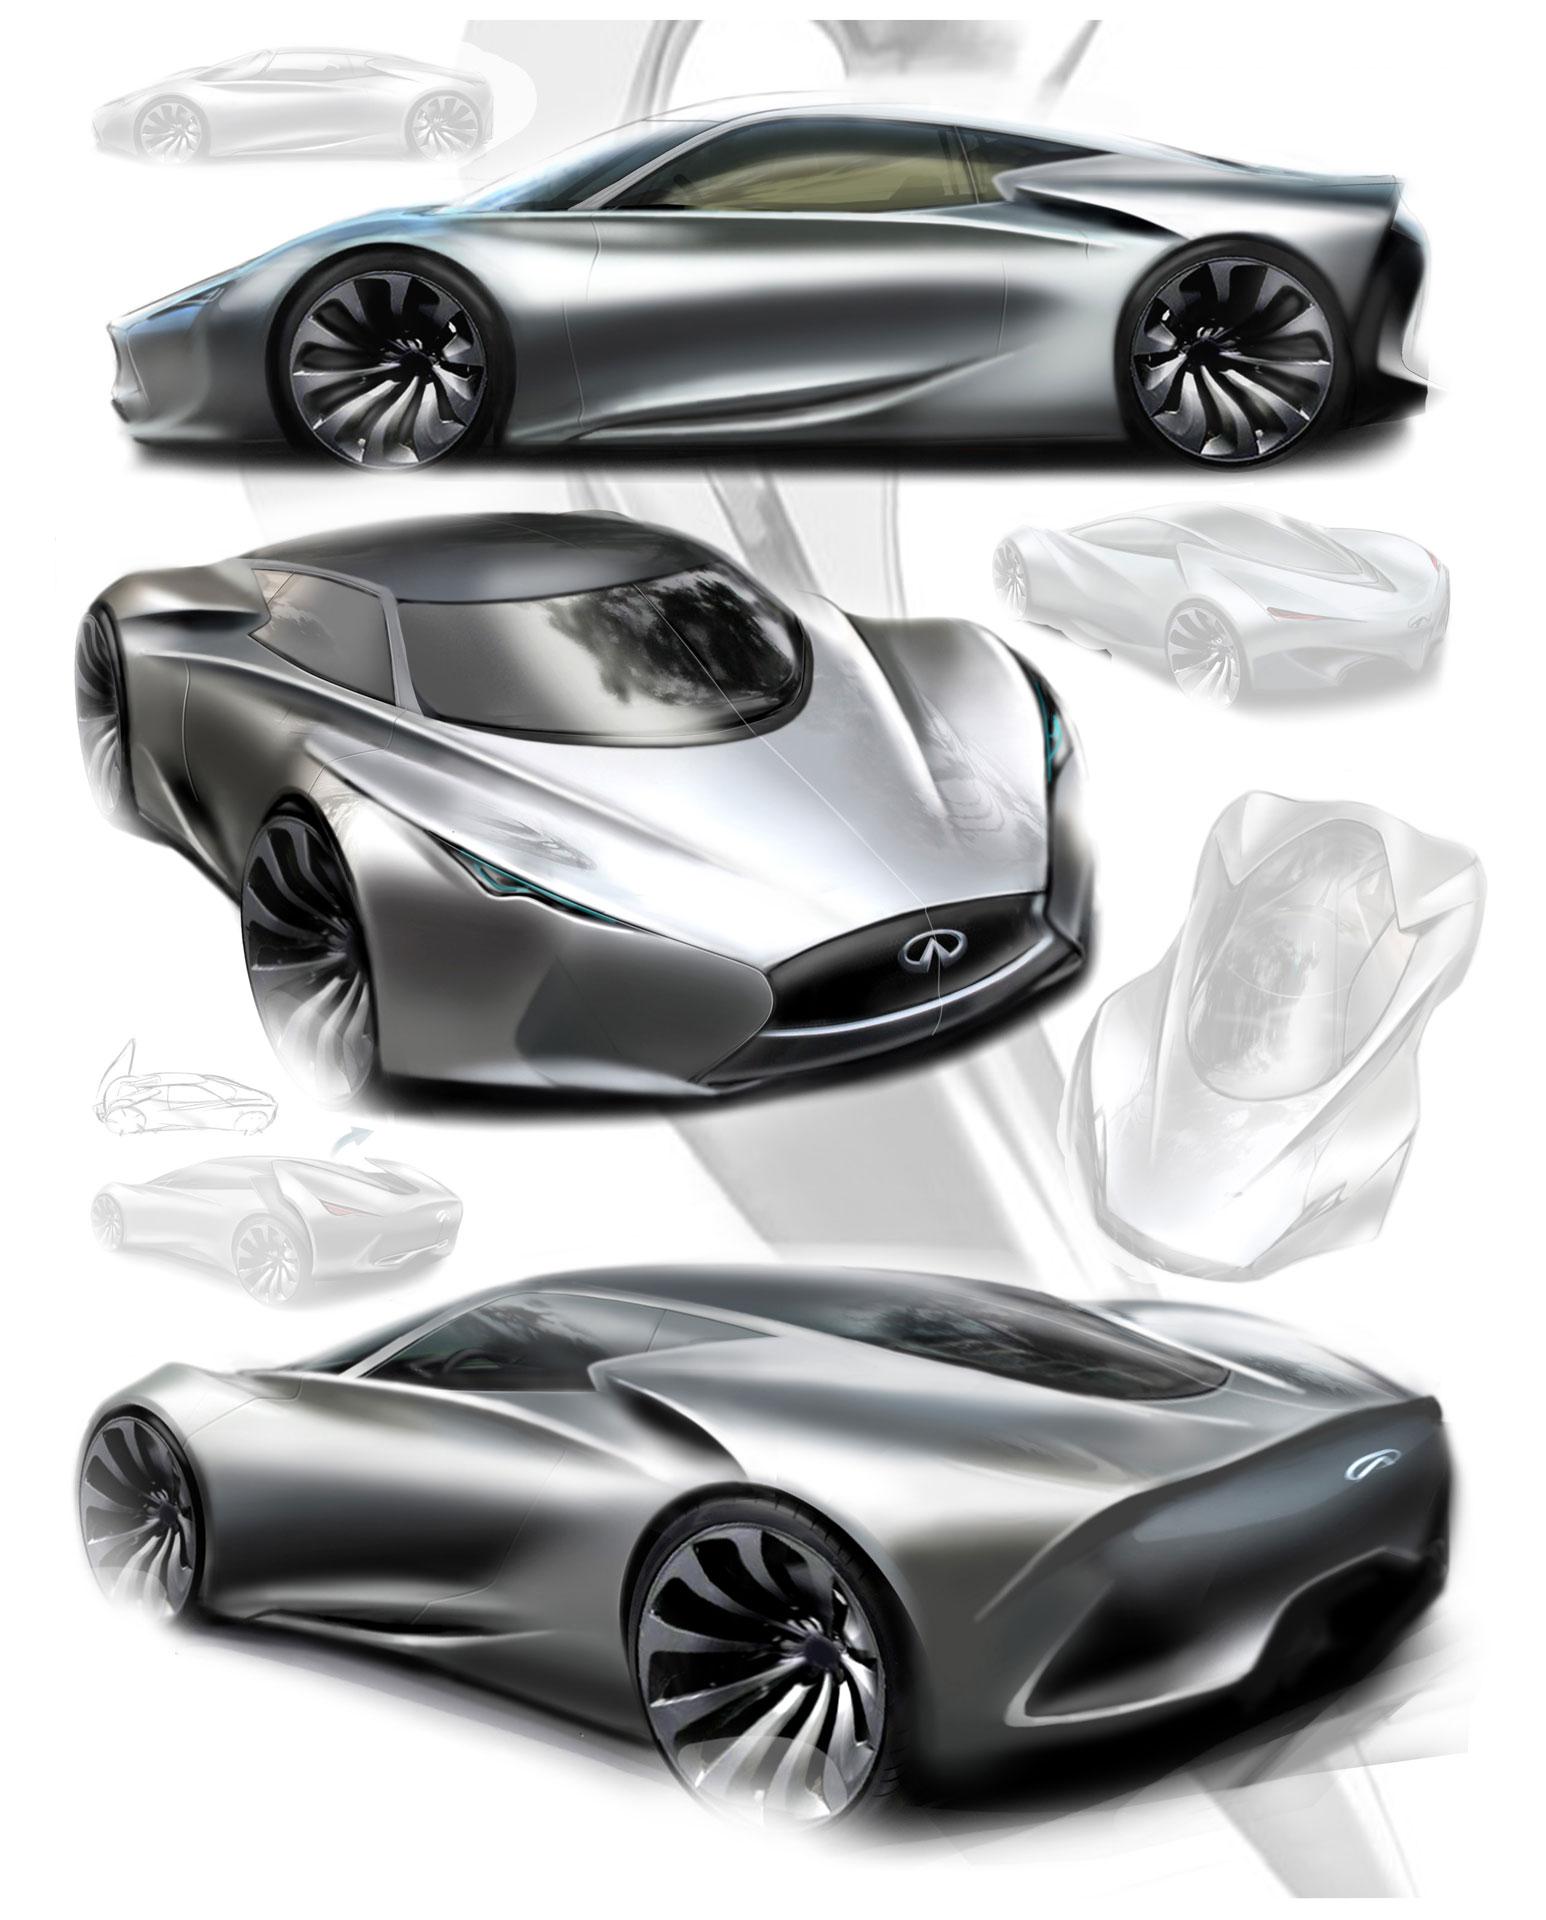 Infiniti Emerg E Concept Design Sketches Car Body Design